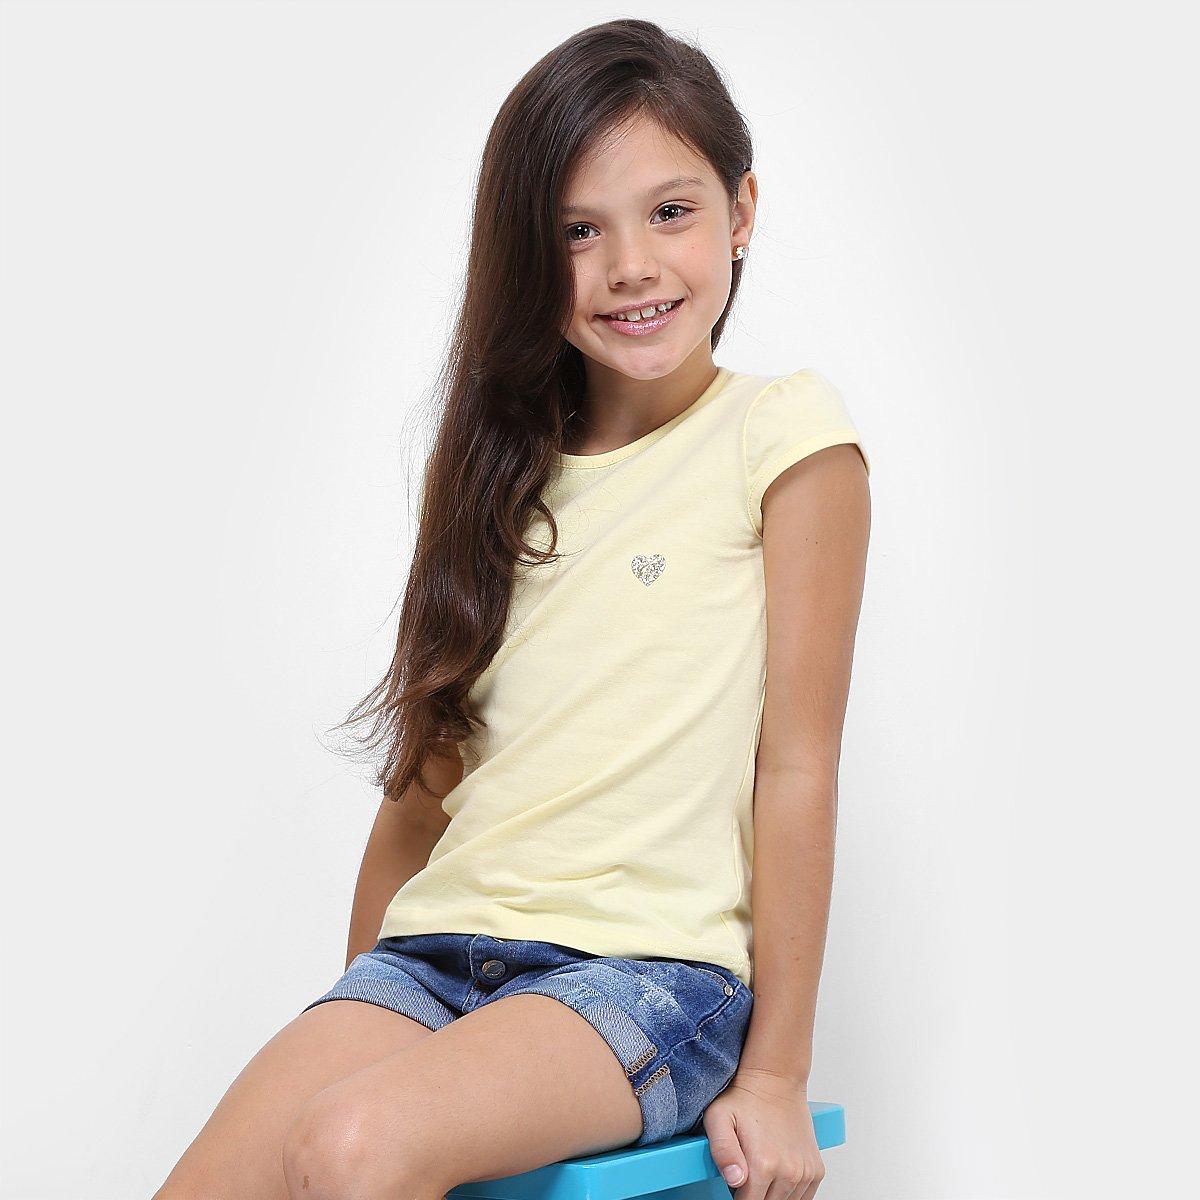 Amarelo Blusa Básica Infantil Feminina Blusa Infantil Kamylus HwHPqY0